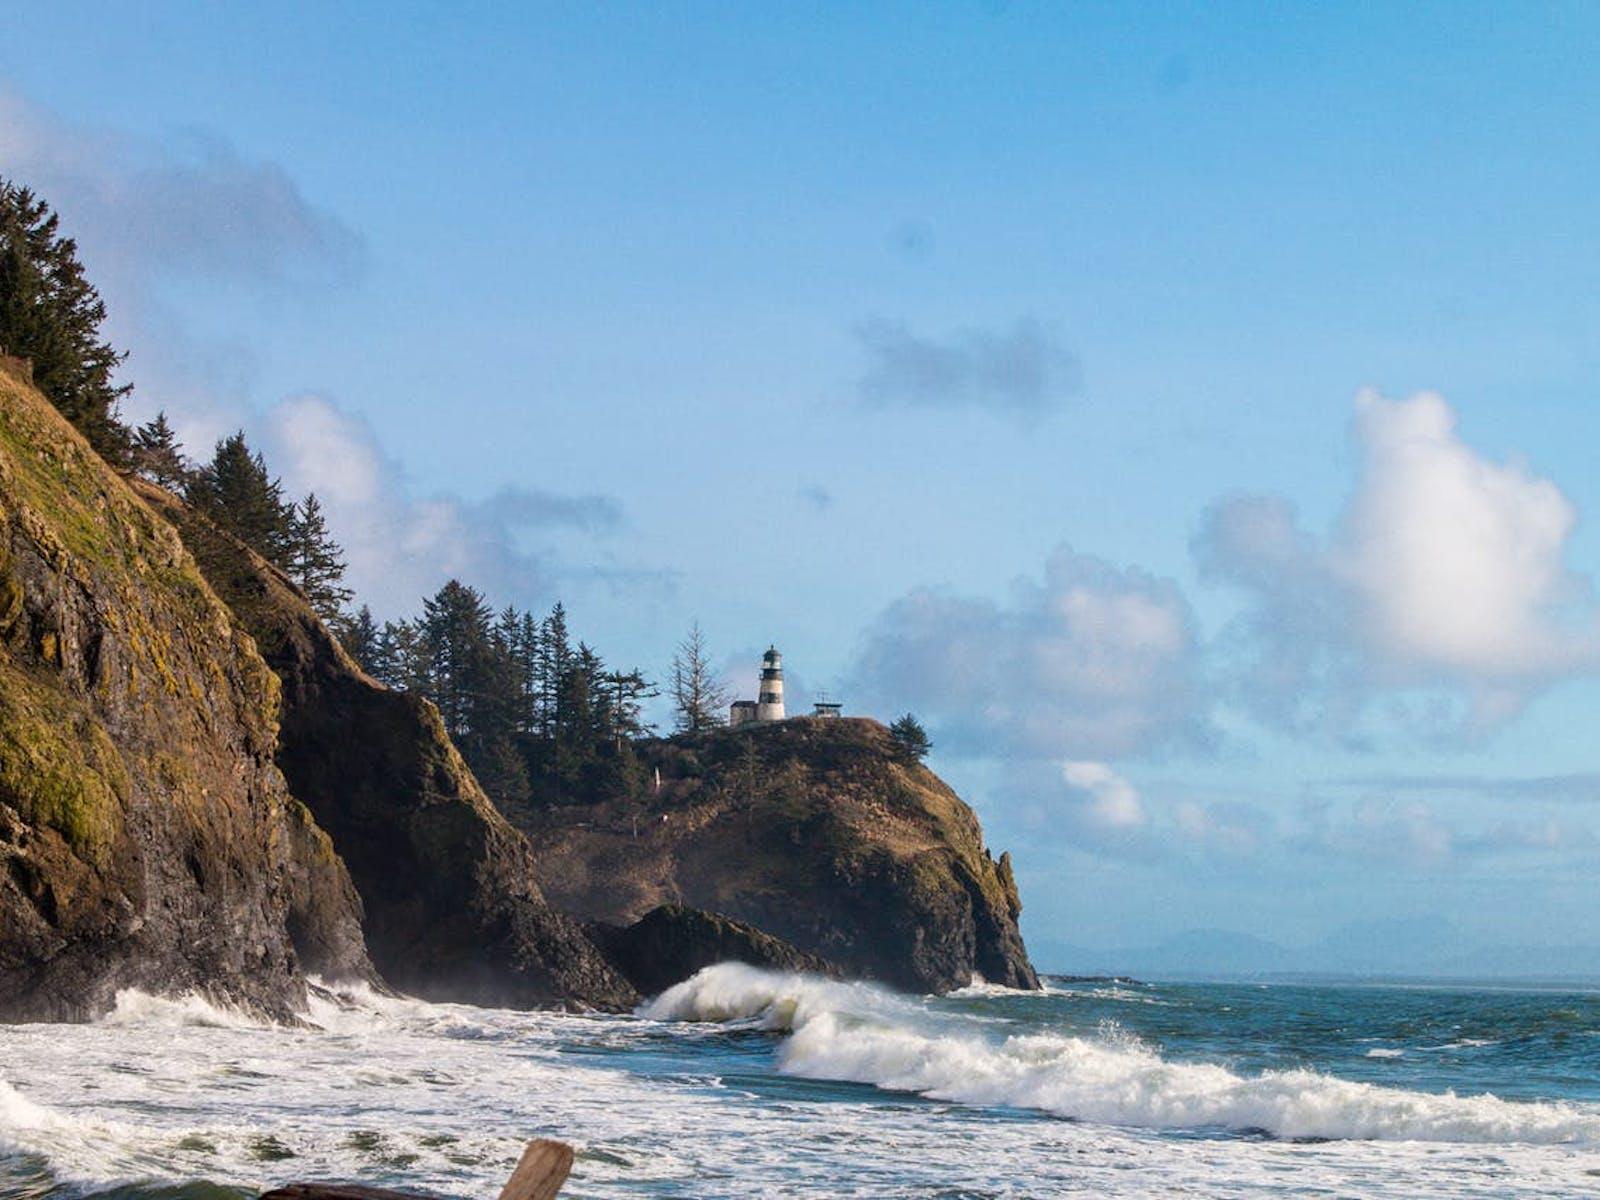 rocky coastline of Washington state